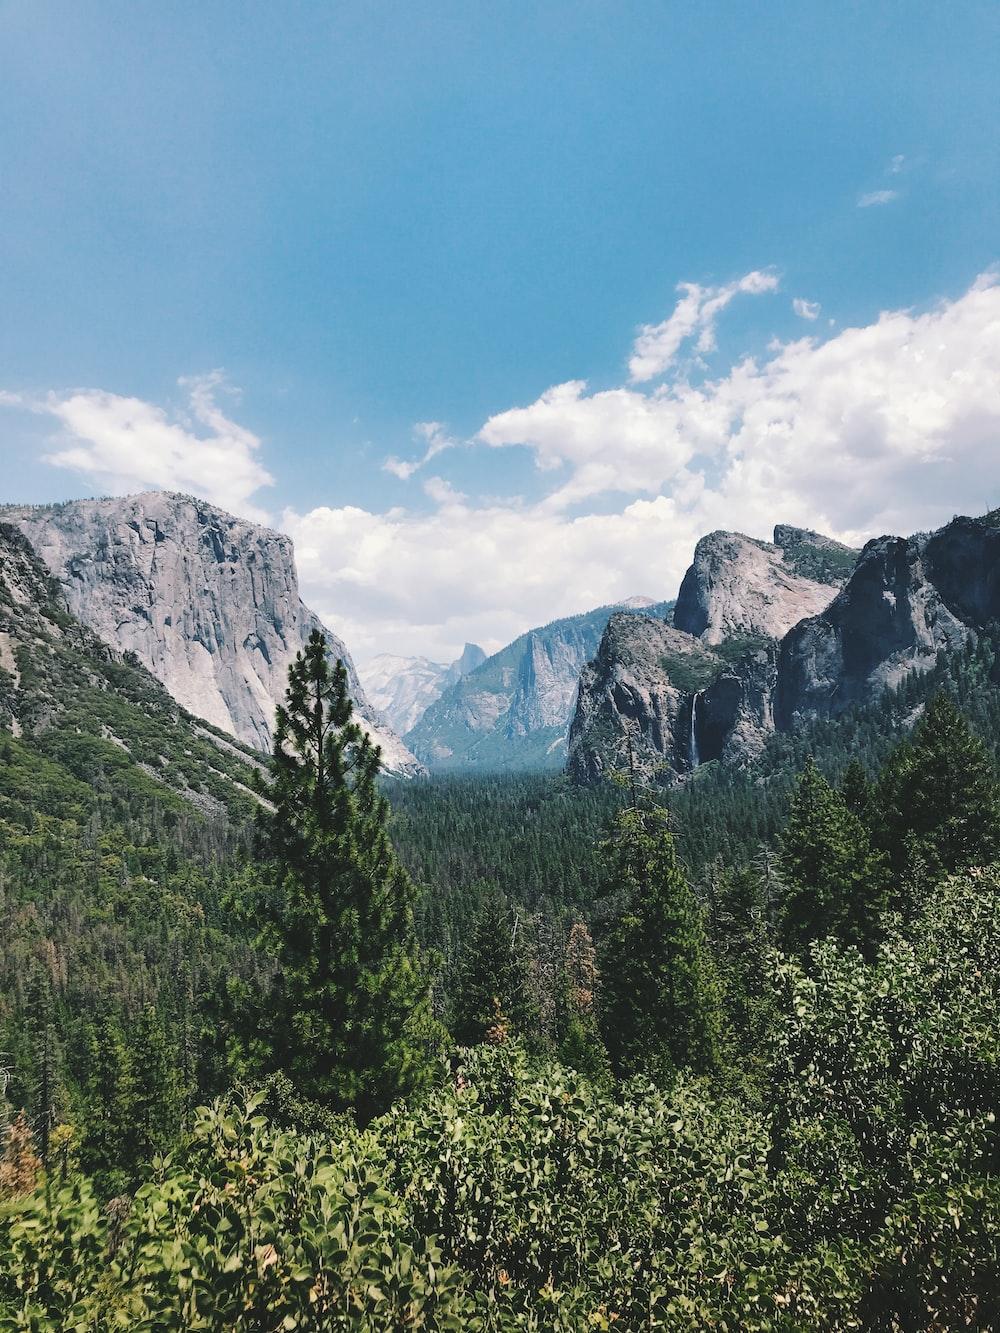 green pine tree and mountain